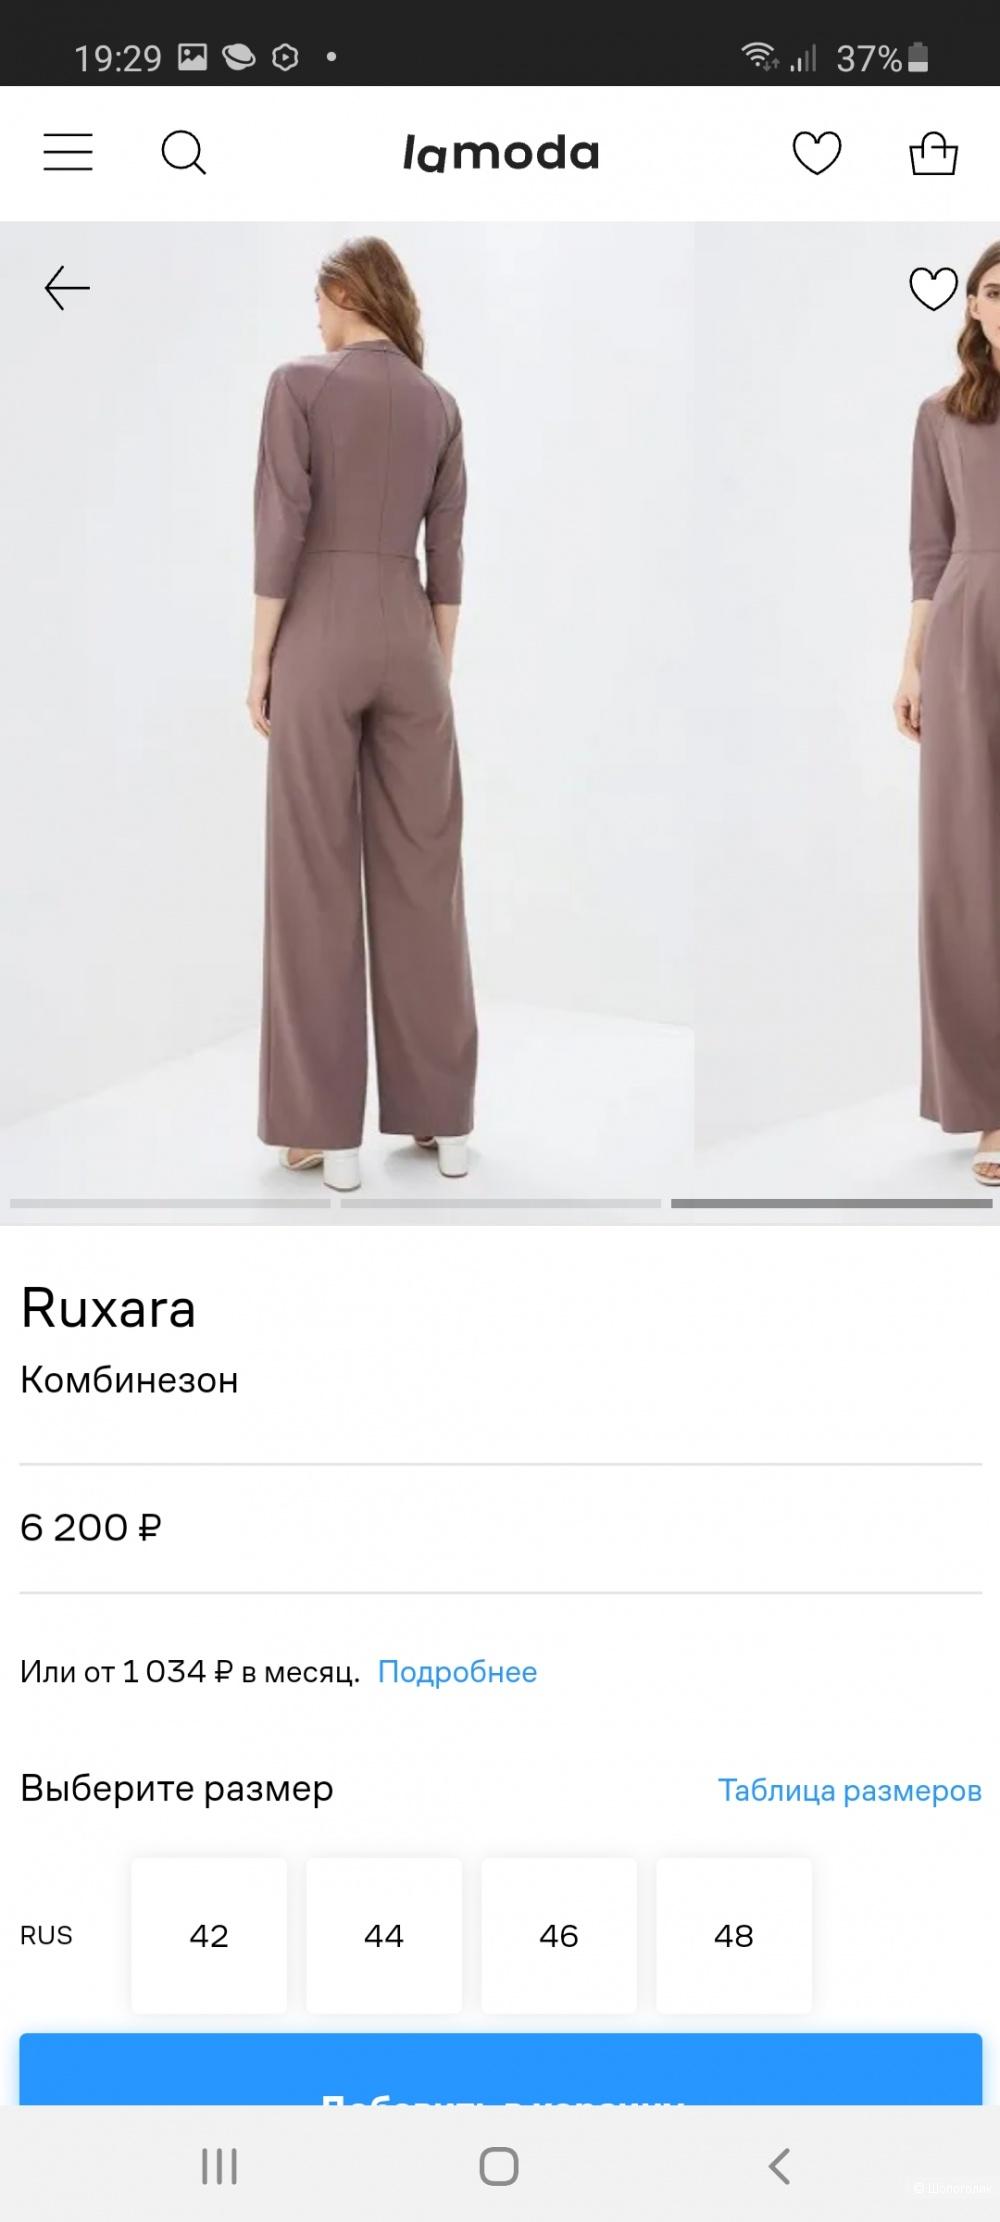 Комбинезон Ruxara, 46-48 размер